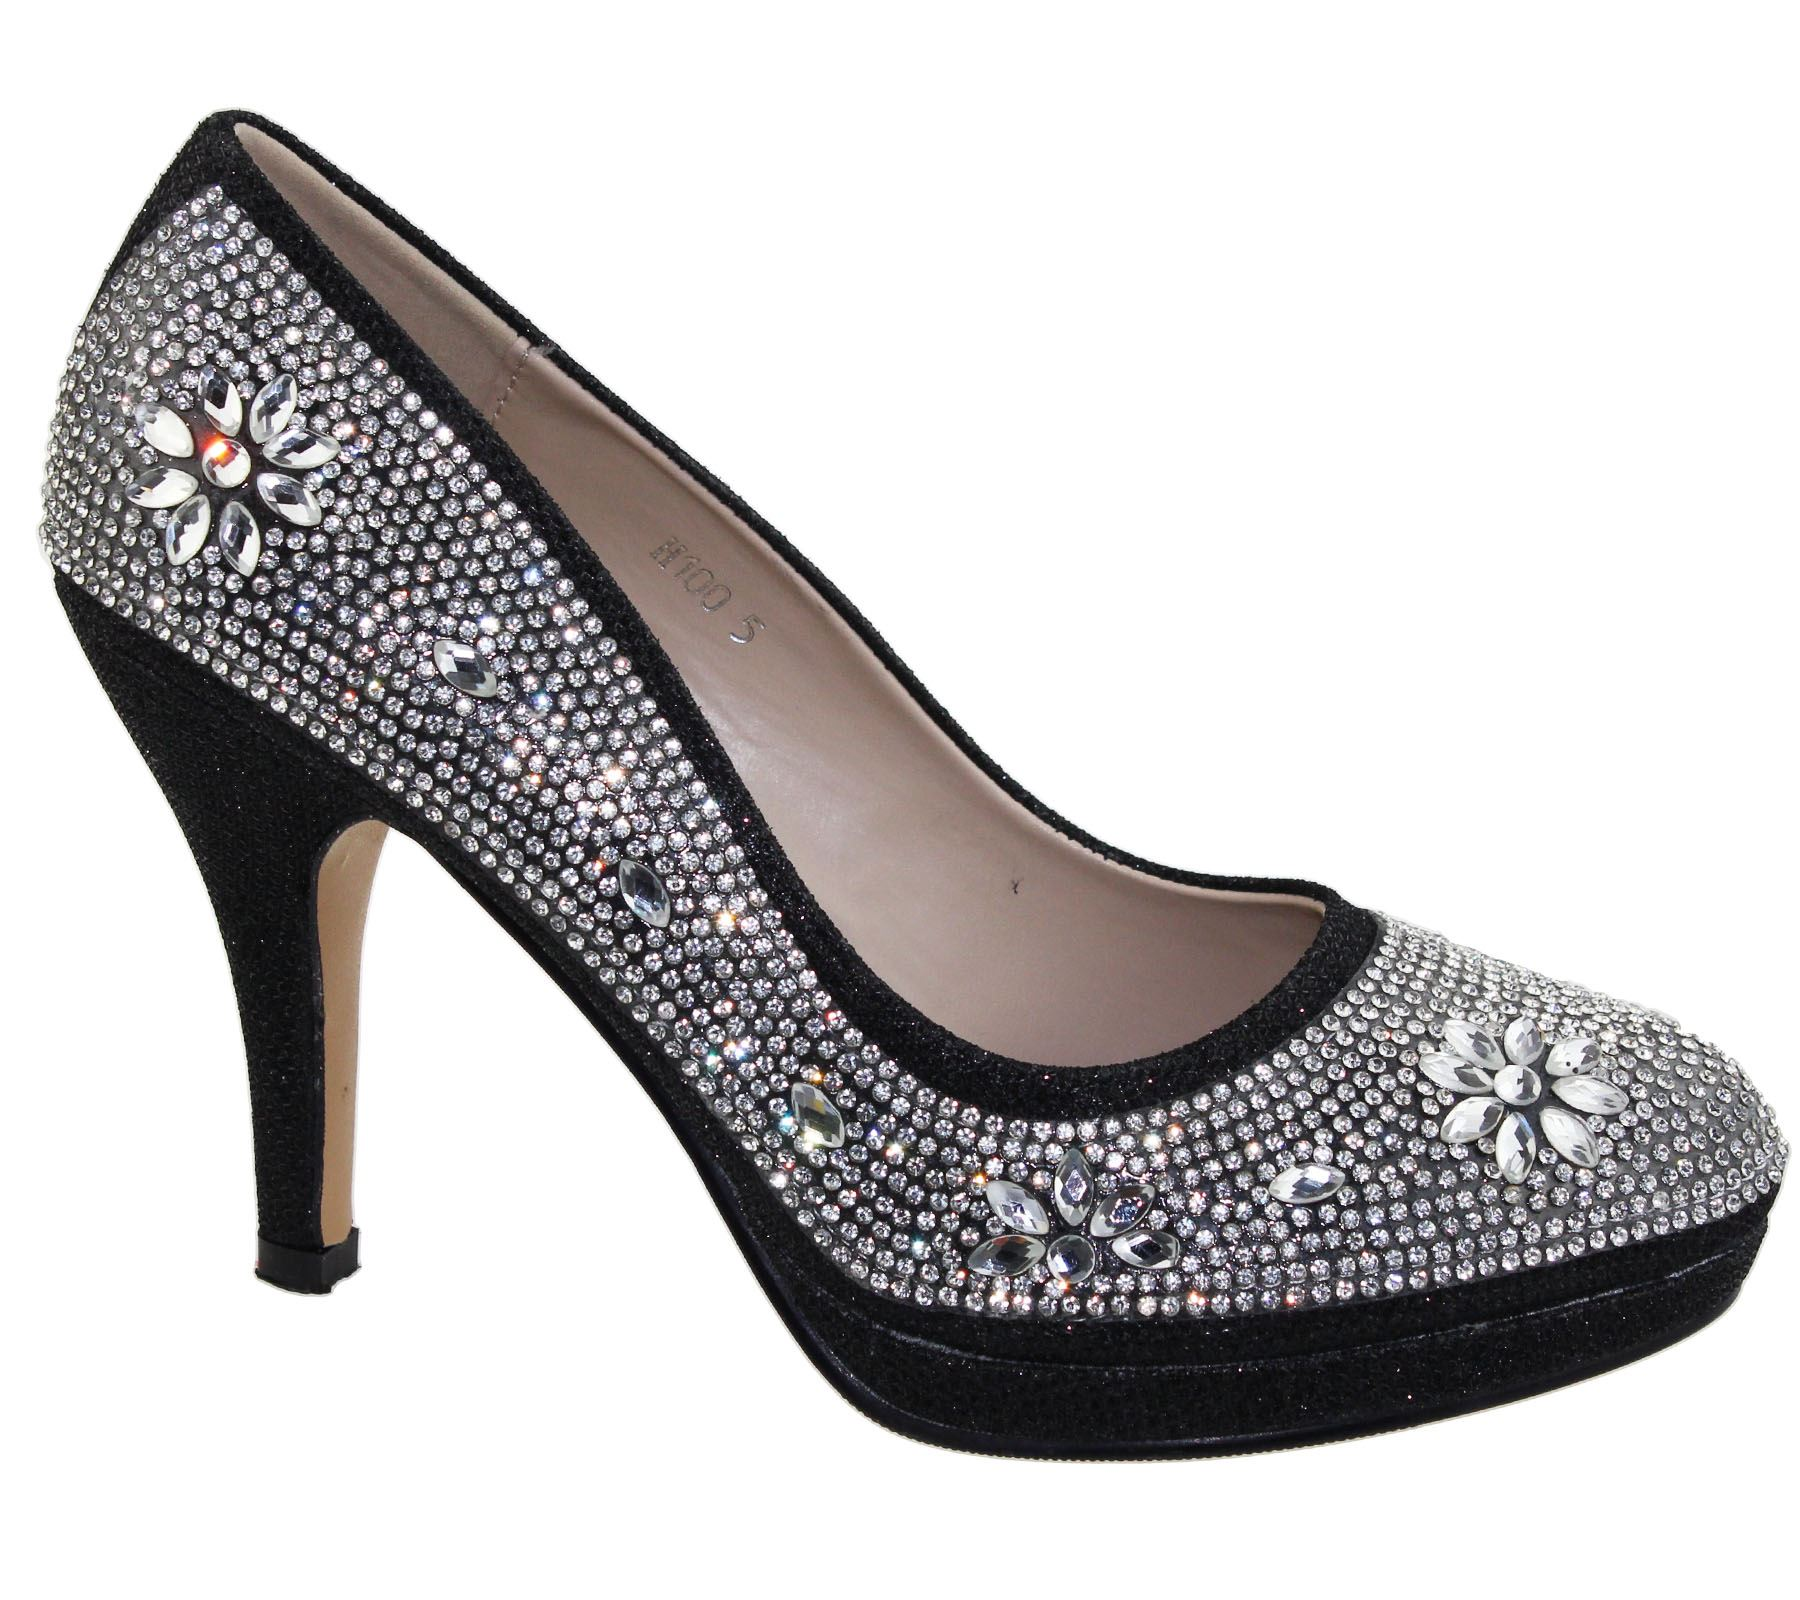 Womens-Platforms-High-Heels-Wedding-Bridal-Evening-Diamante-Ladies-Party-Shoes miniatura 4